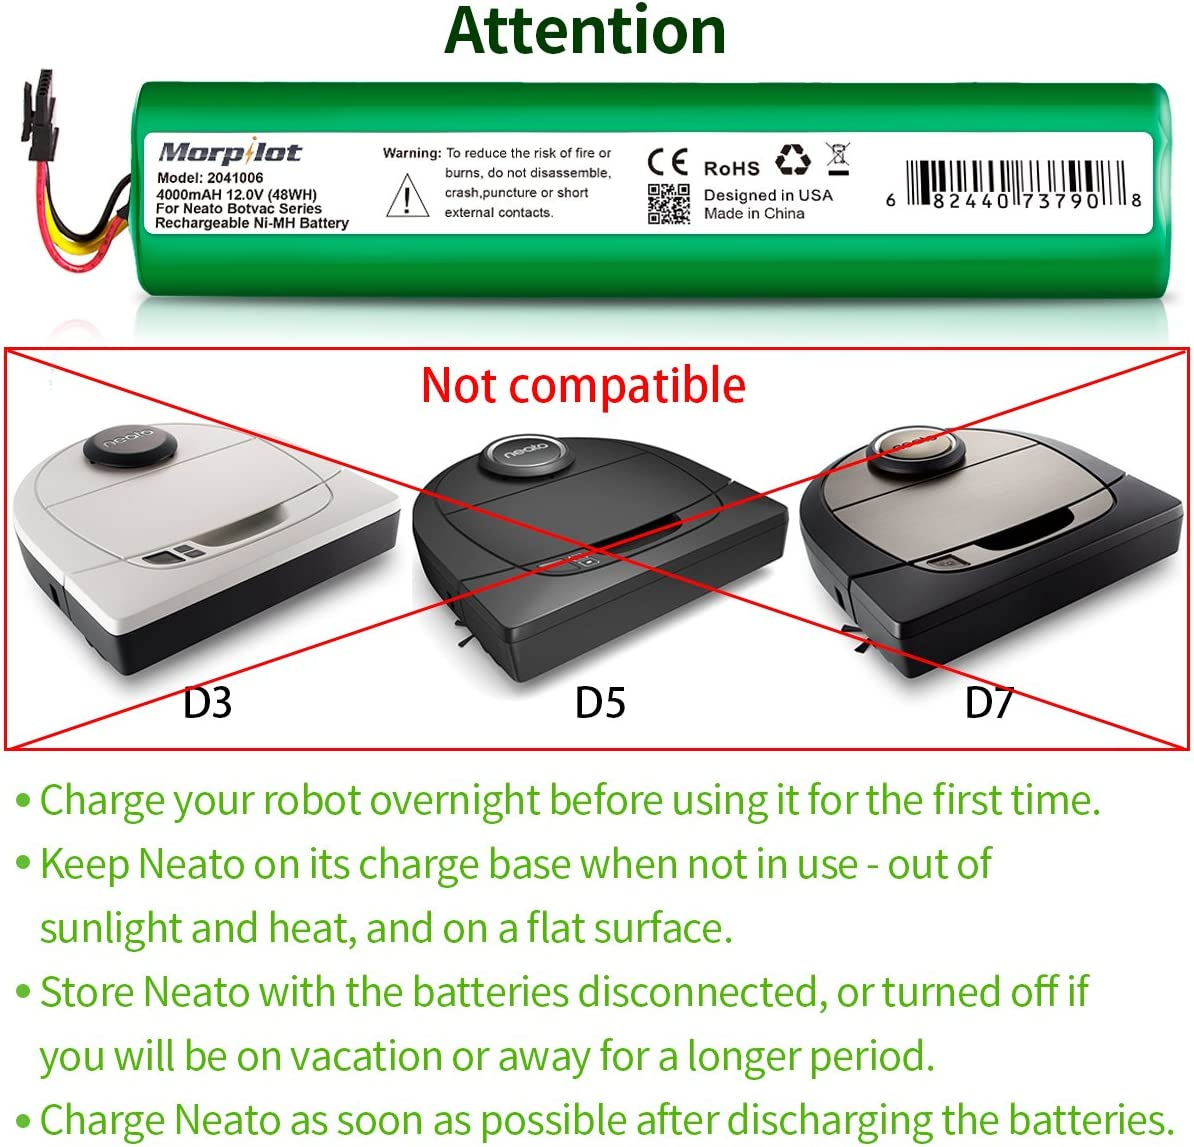 Morpilot 12V 4000mAh NiMh Battery for Neato Botvac Series 70e, 75, 80, 85 Robotic Vacuum 945-0129 945-0174 (Not compatible with Neato D3 D5 D7): Home & Kitchen